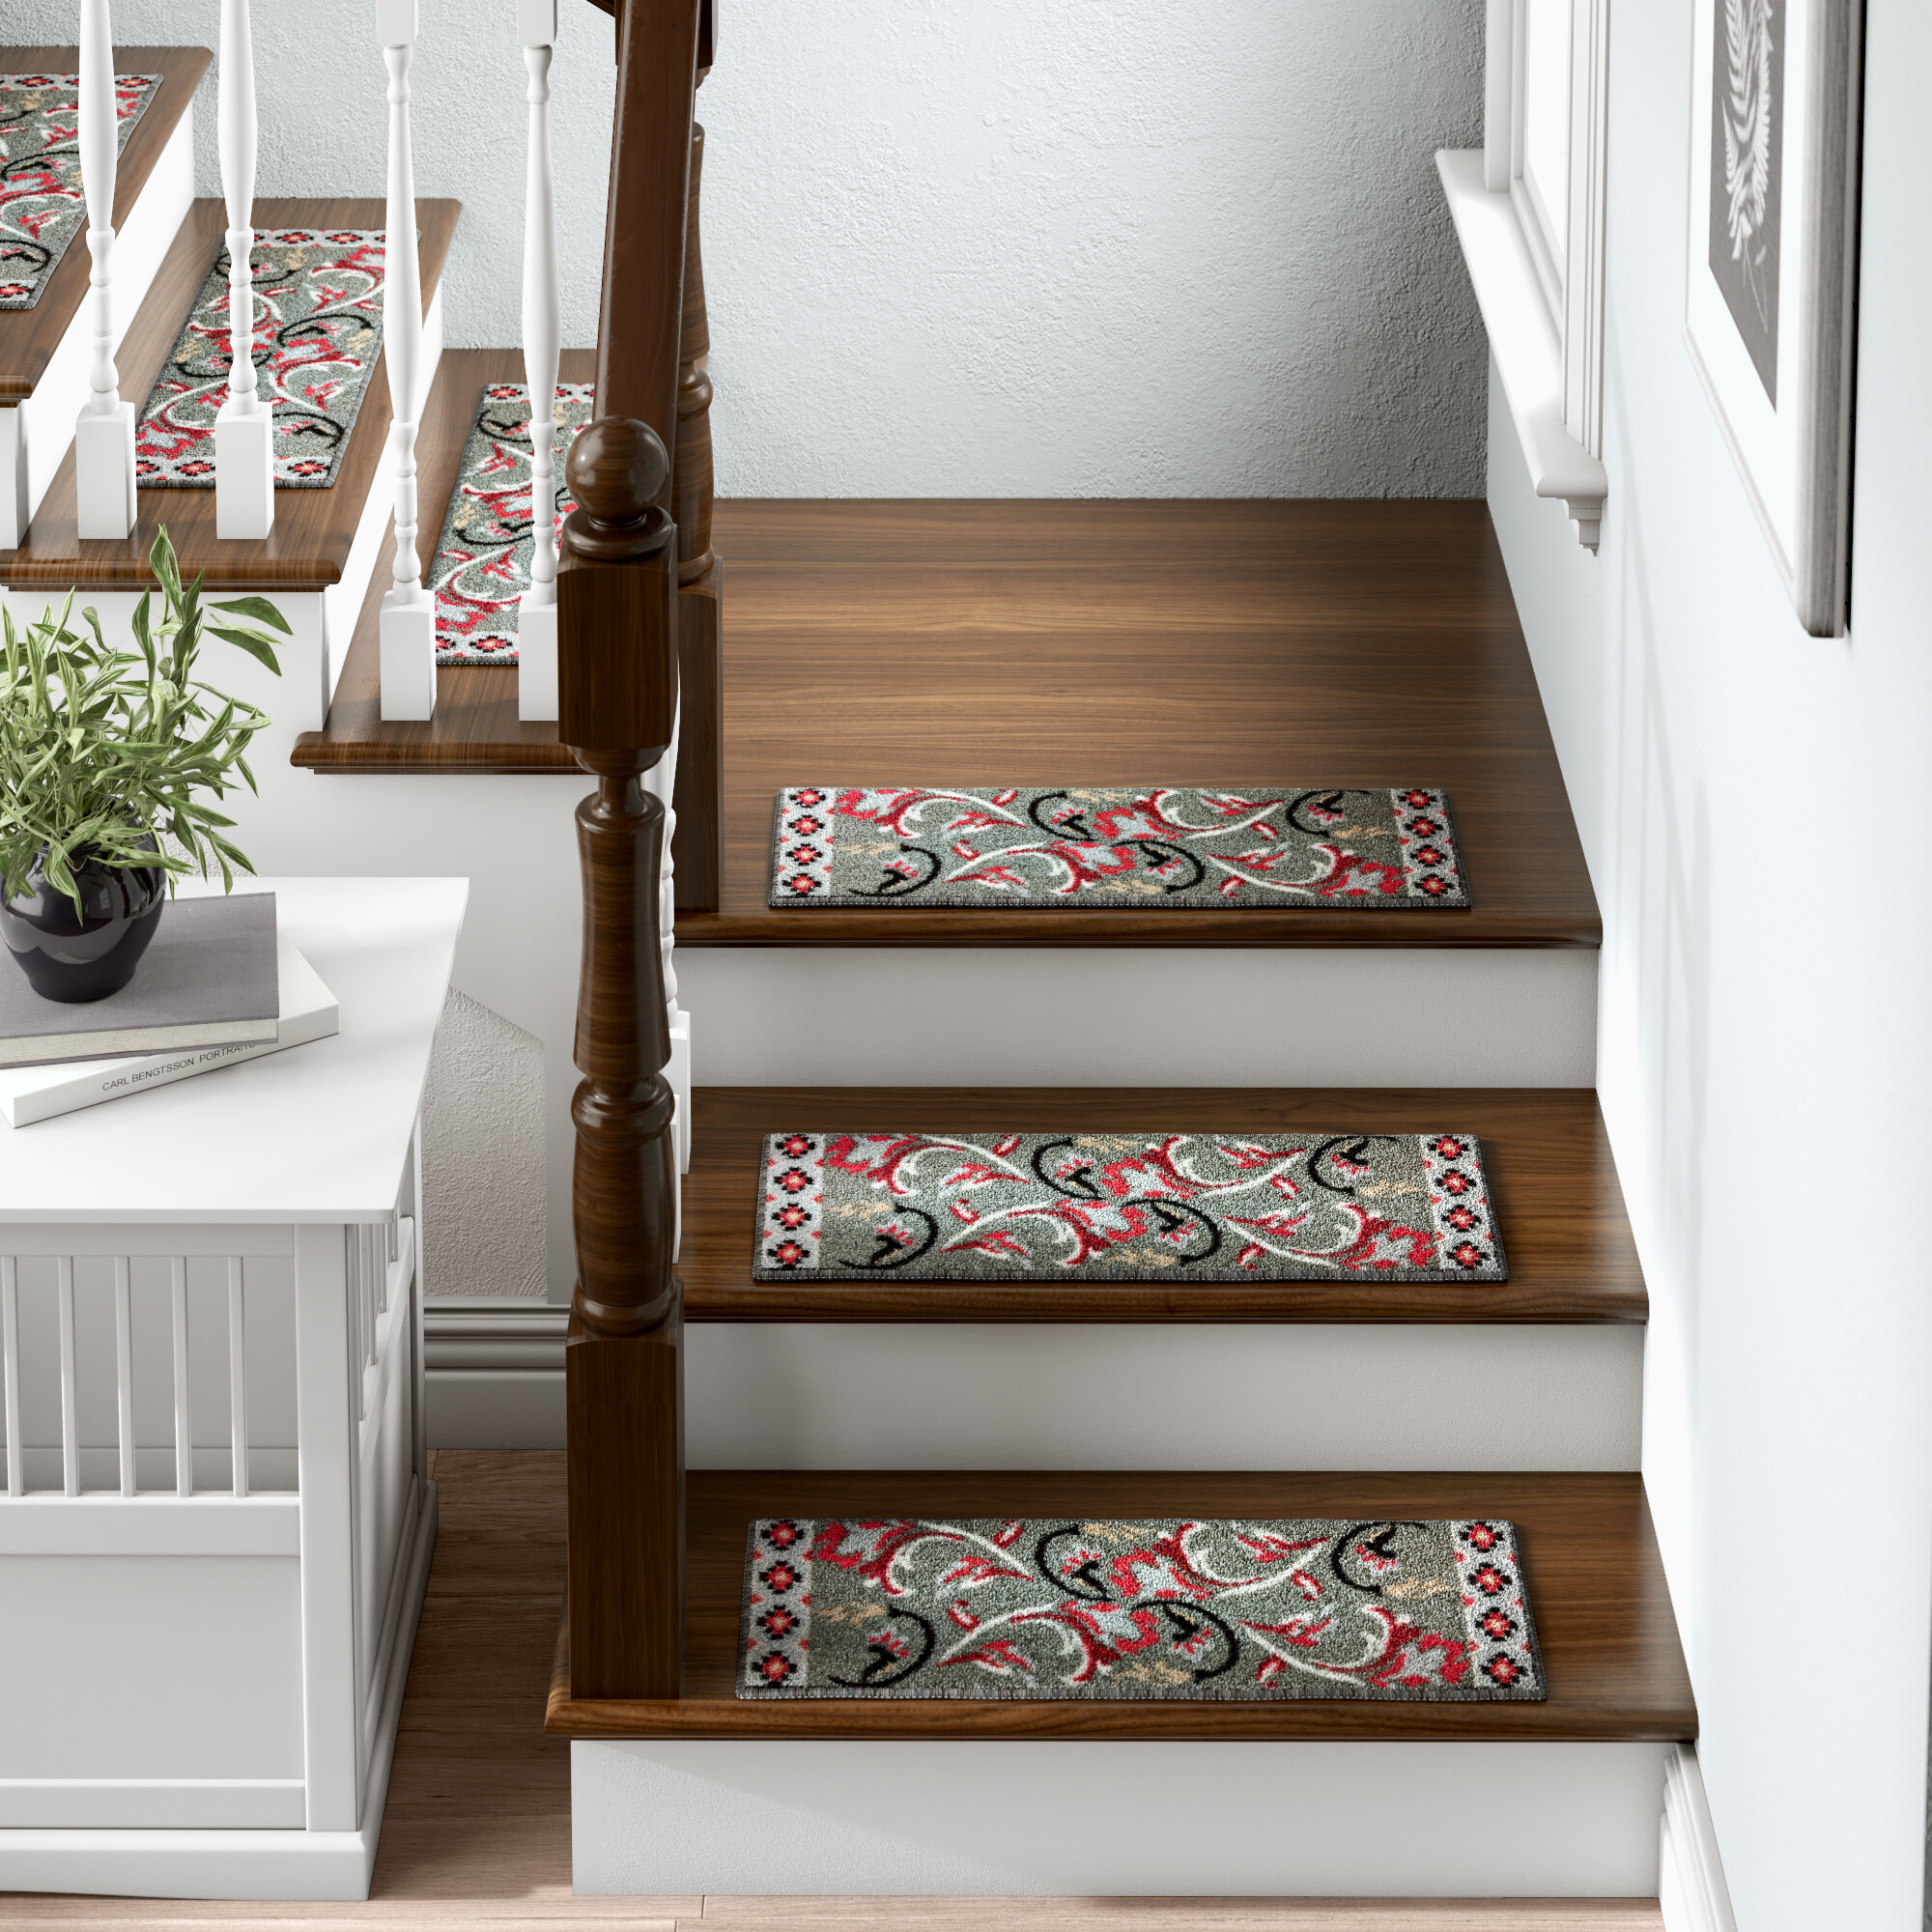 Tucker Murphy Pet Baynes Modern Design Non Slip Rubber Backed Gray Stair Tread Reviews Wayfair